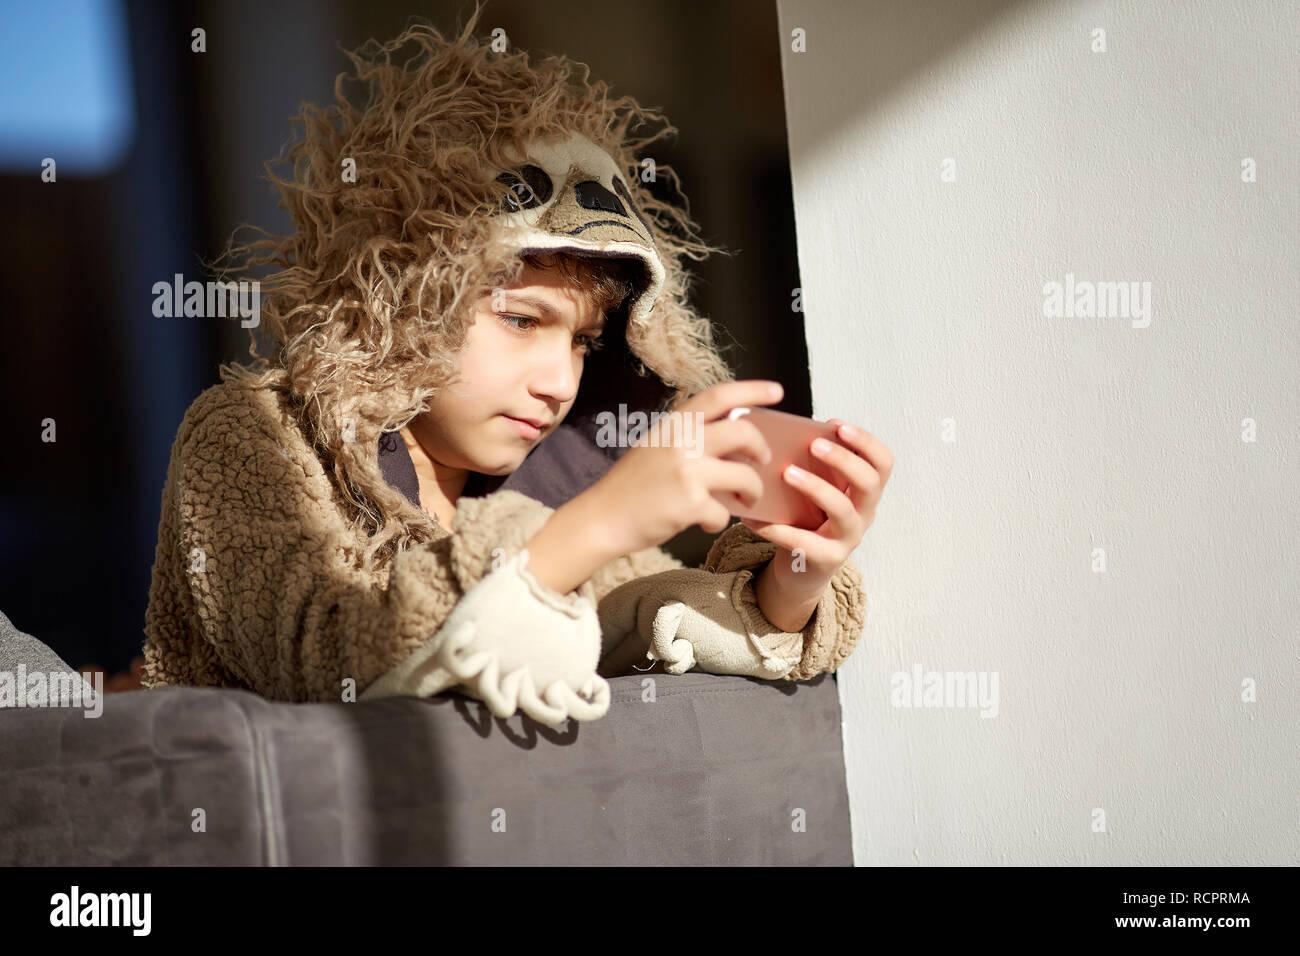 boy in sloth pajamas playing mobile phone - Stock Image